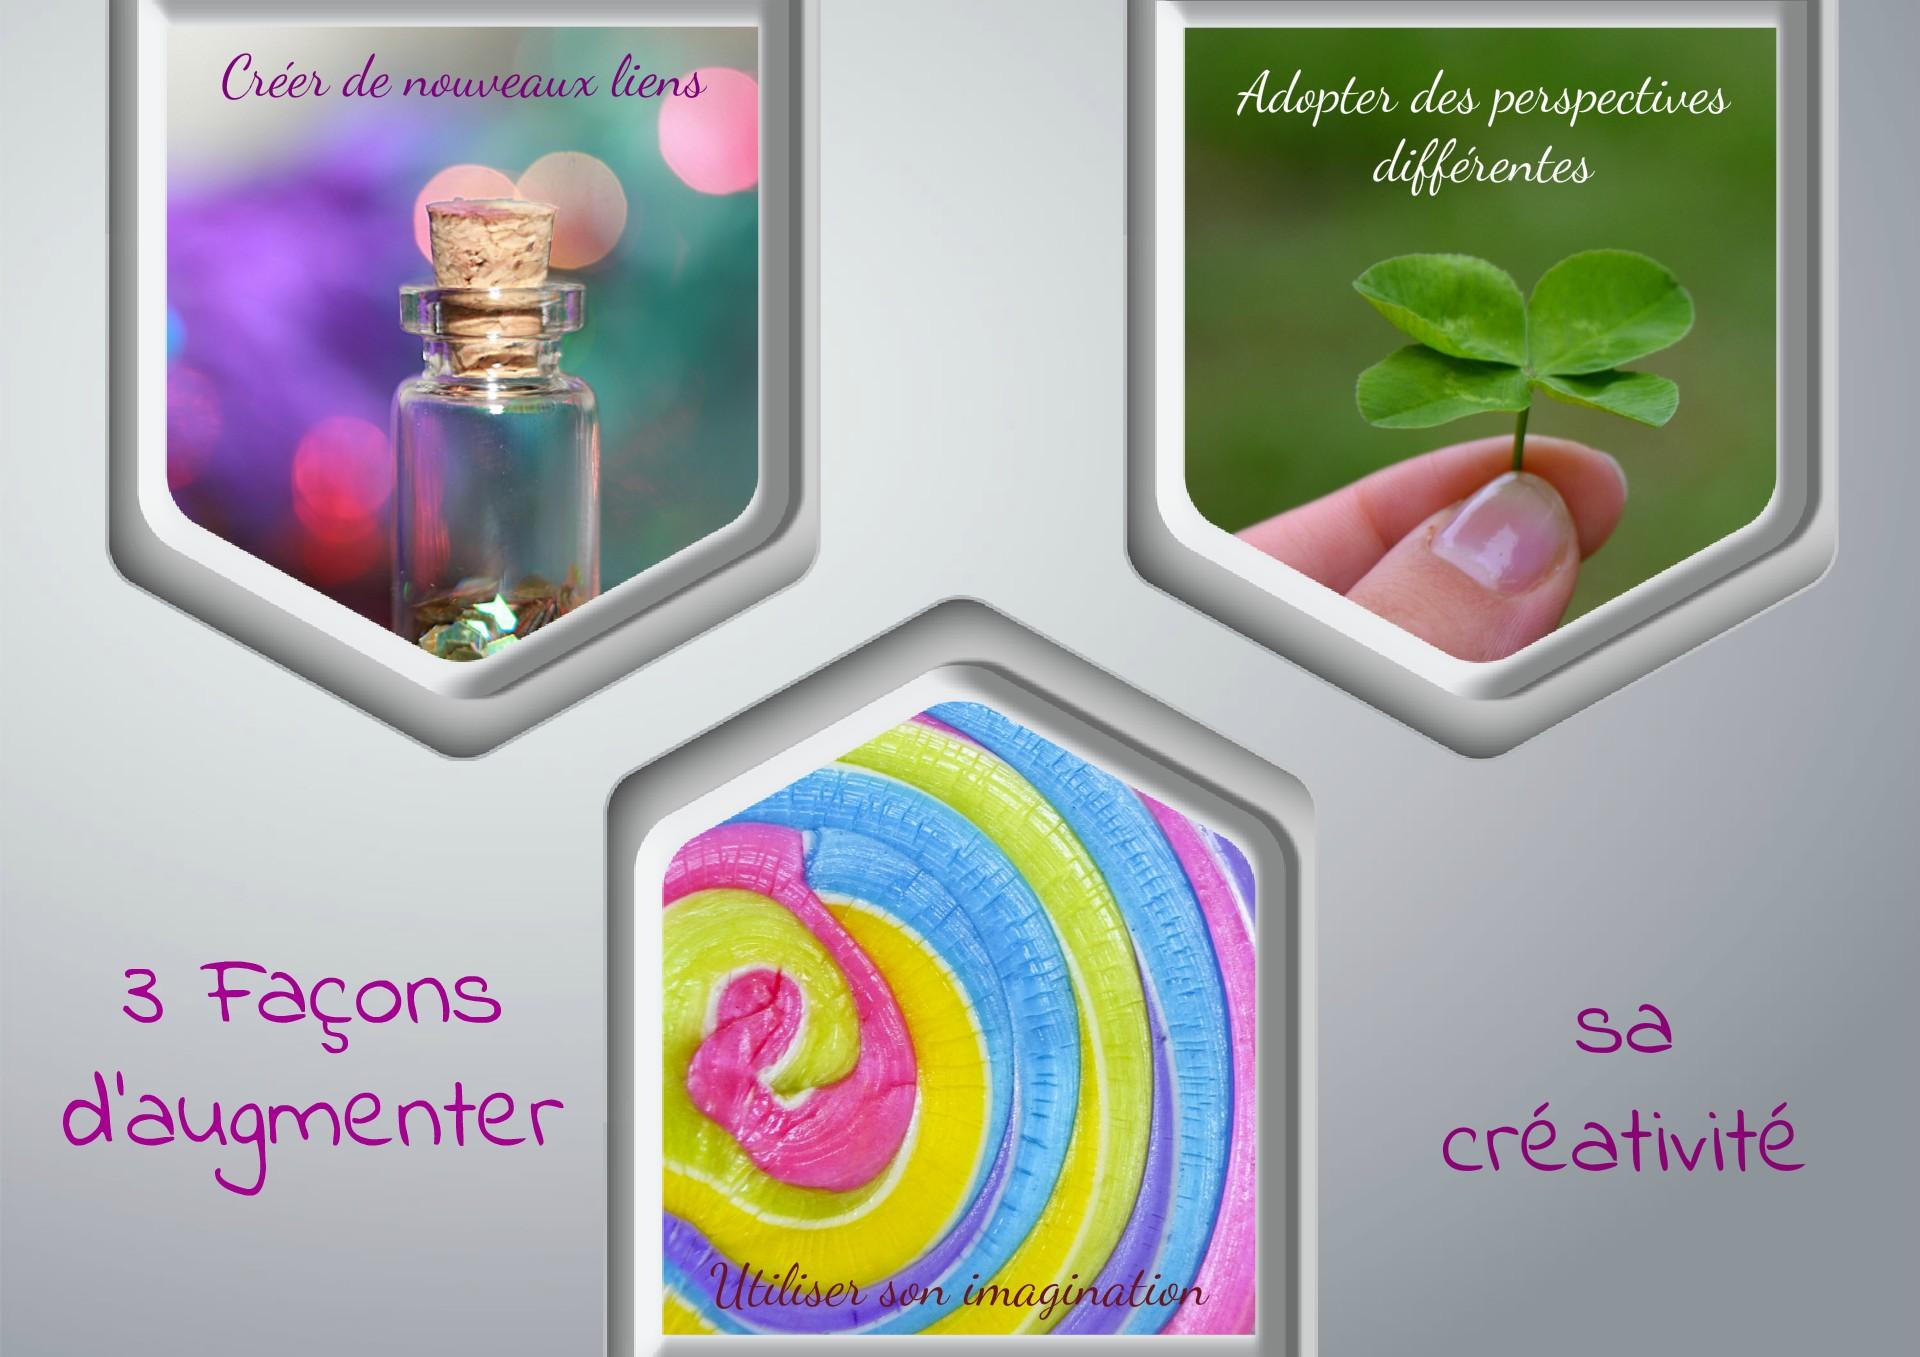 3 facons d 'augmenter sa créativité